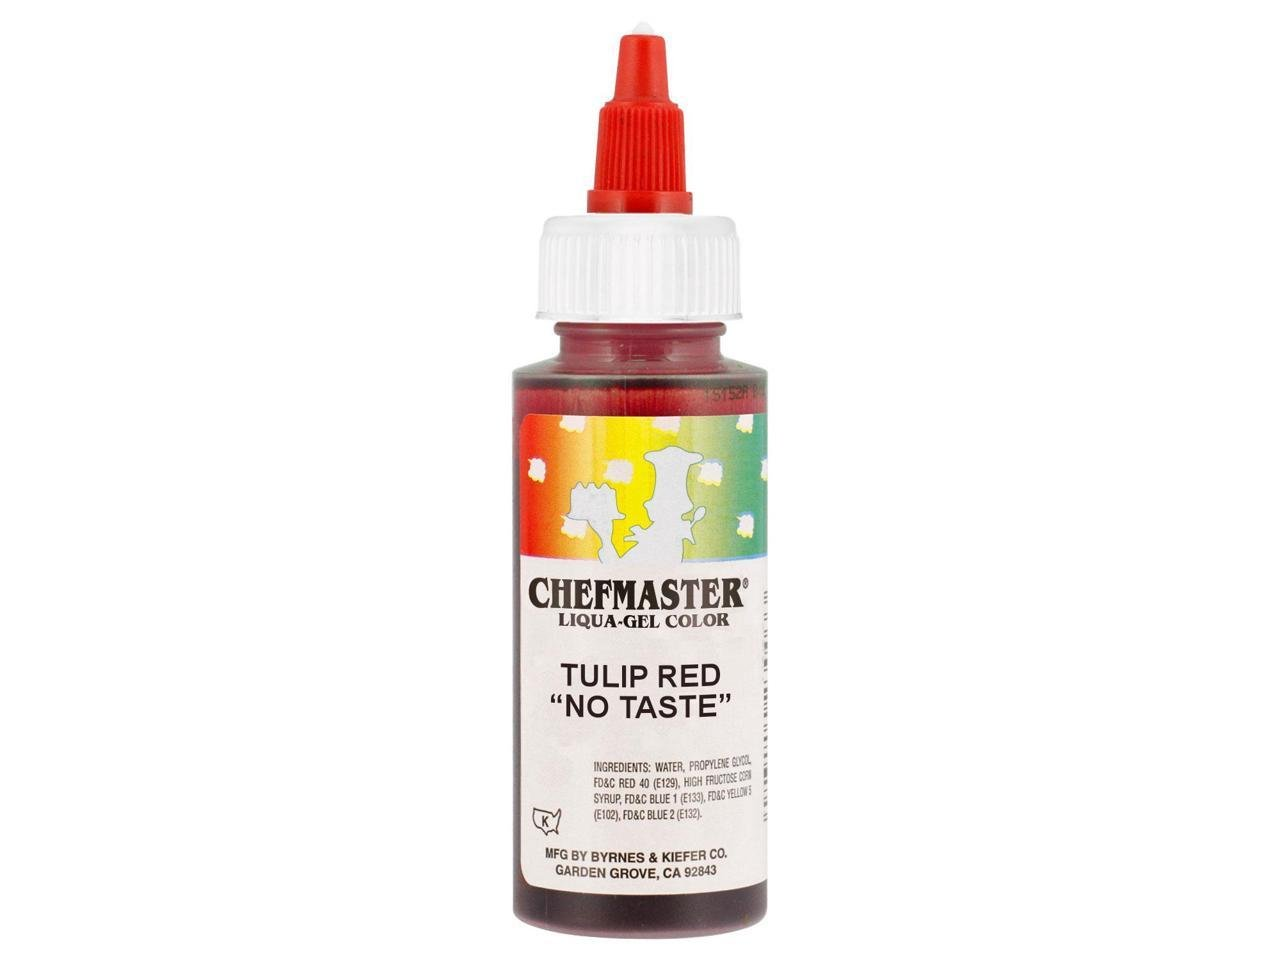 Chefmaster Liqua-Gel Food Color. 2.3 oz. - Tulip Red (no taste ...